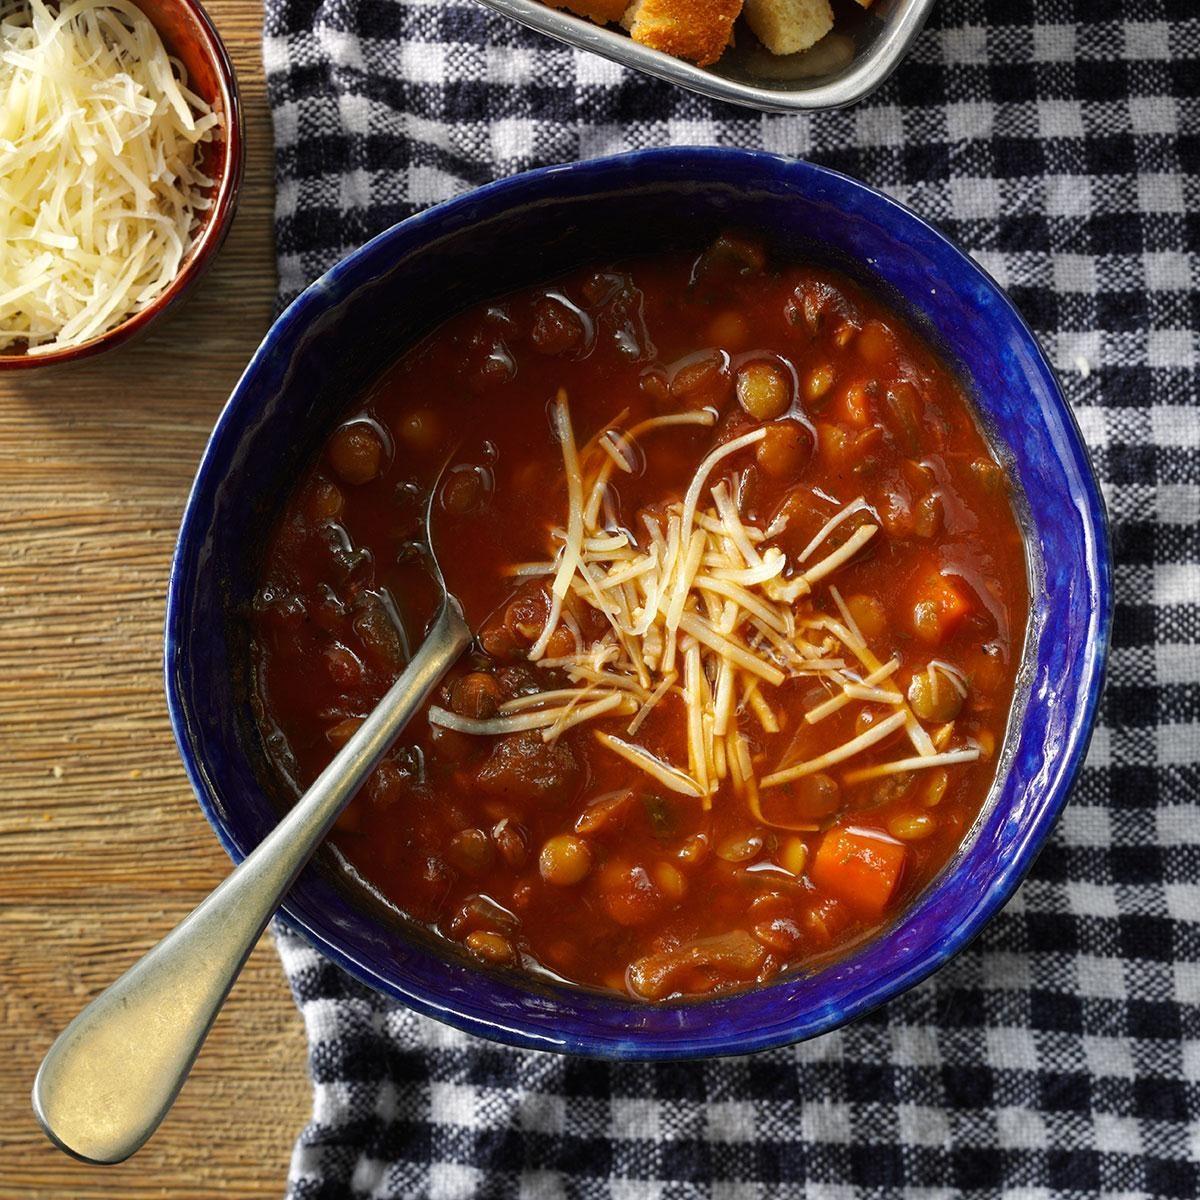 Virginia: Italian-Style Lentil Soup